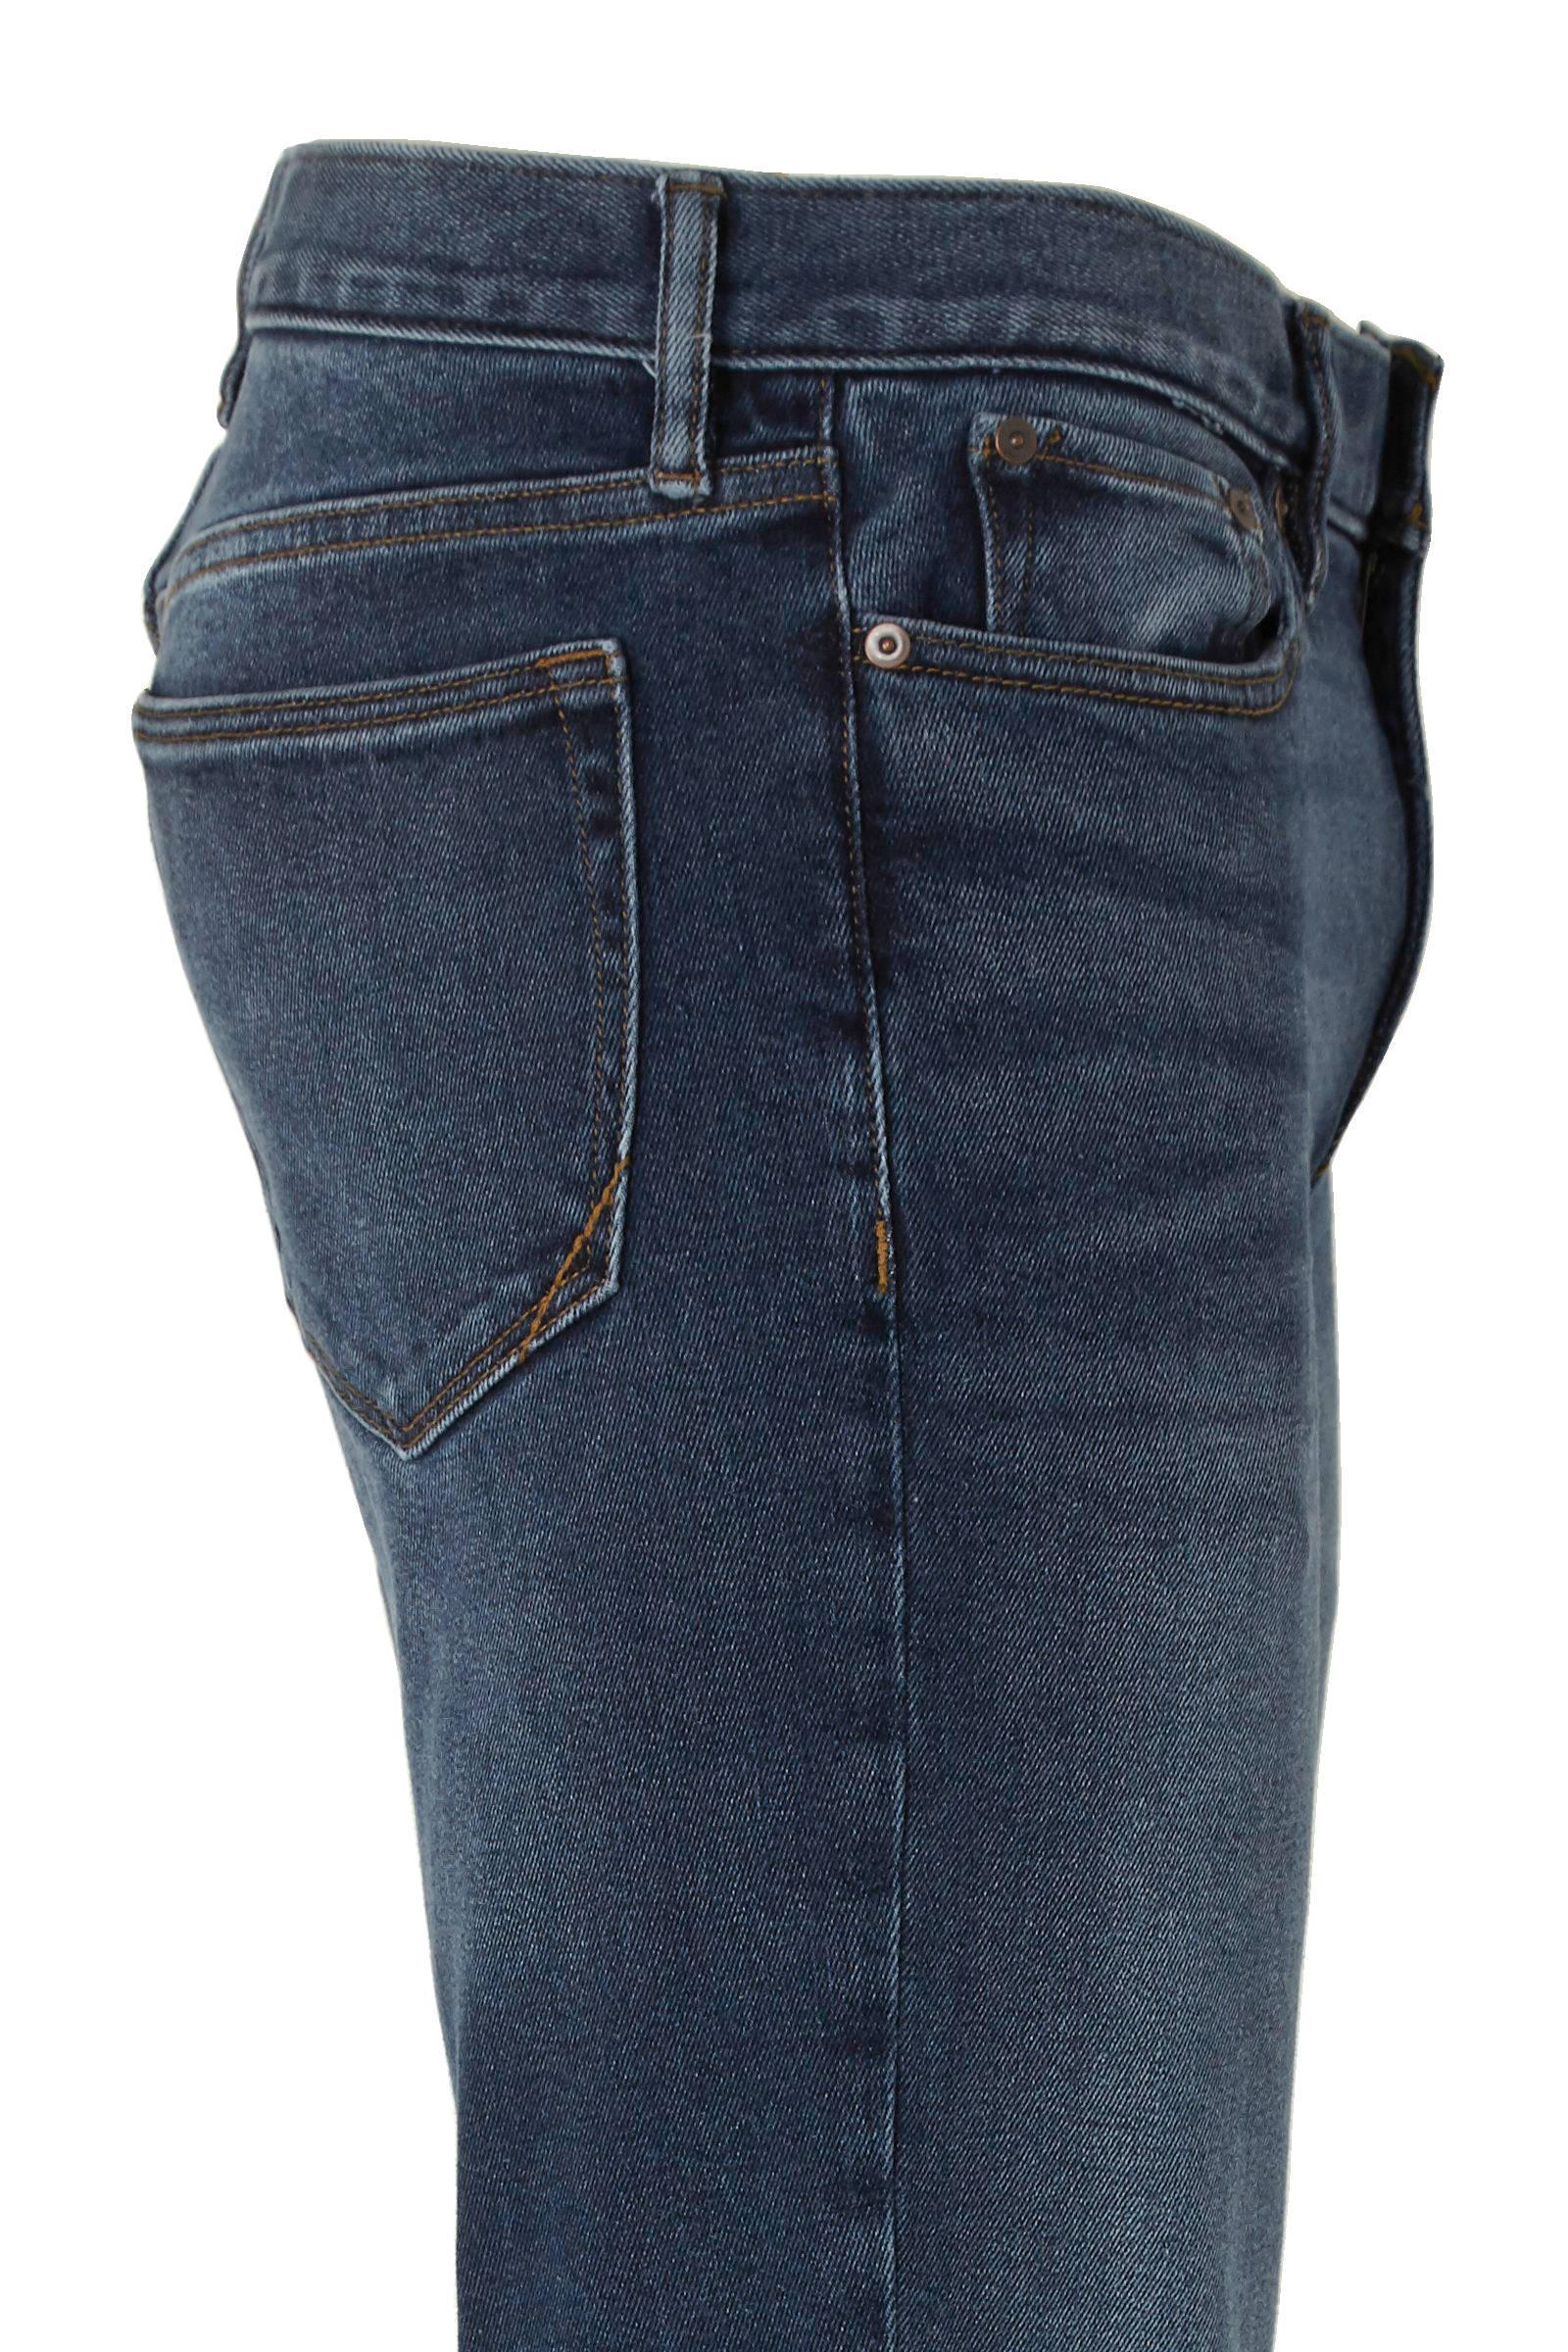 Banana Republic Denim Slim Fit Jeans 905-fresh Air Blue voor heren